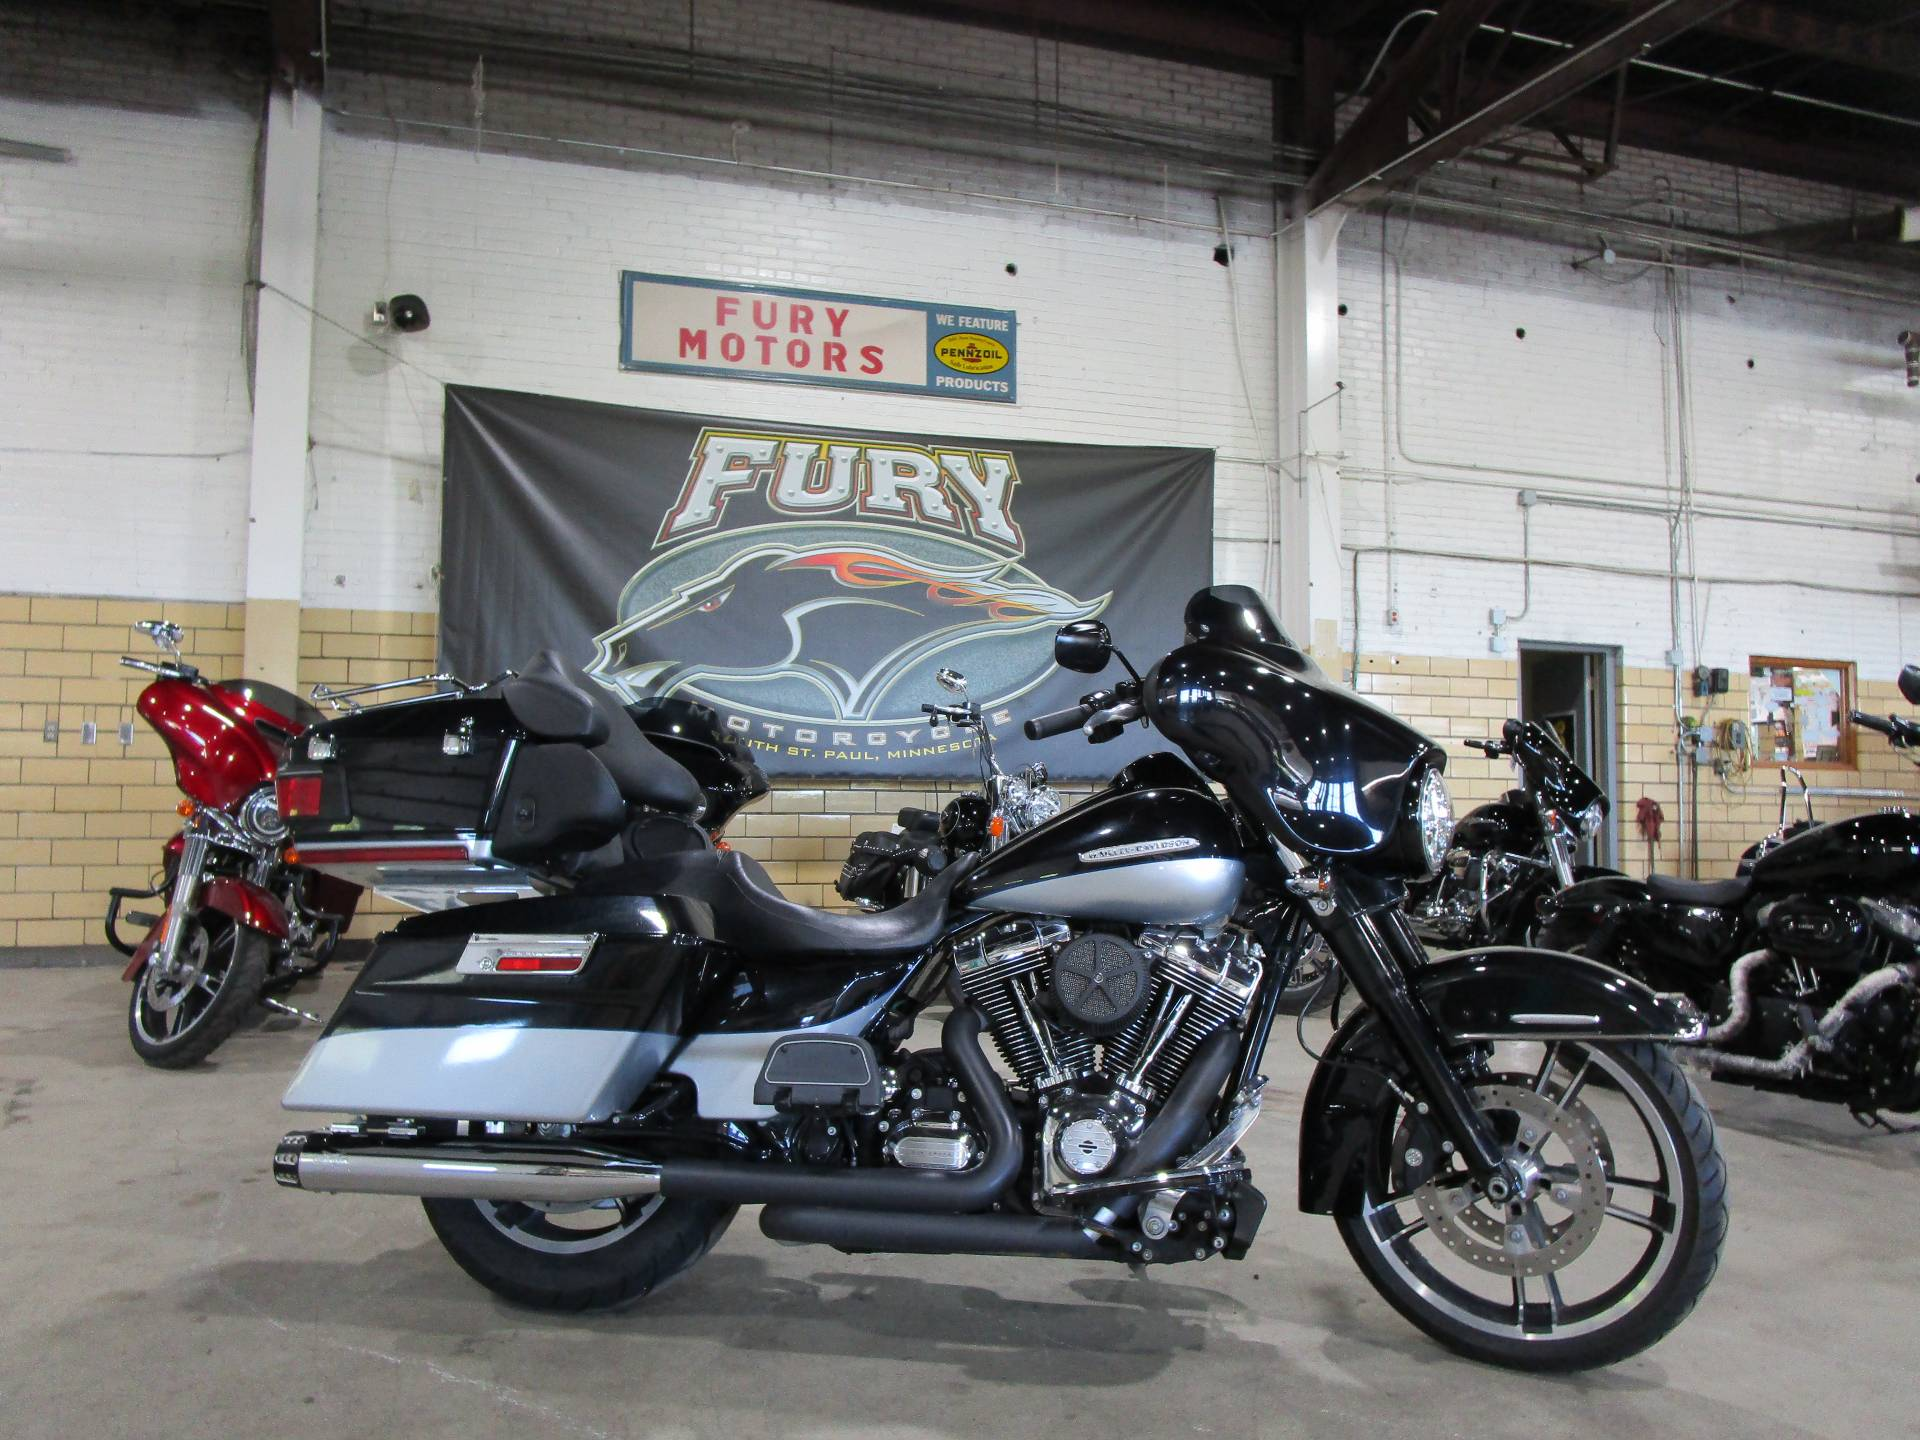 Fury Motors South St Paul >> 2012 Harley Davidson Flhtk Limited In South Saint Paul Minnesota